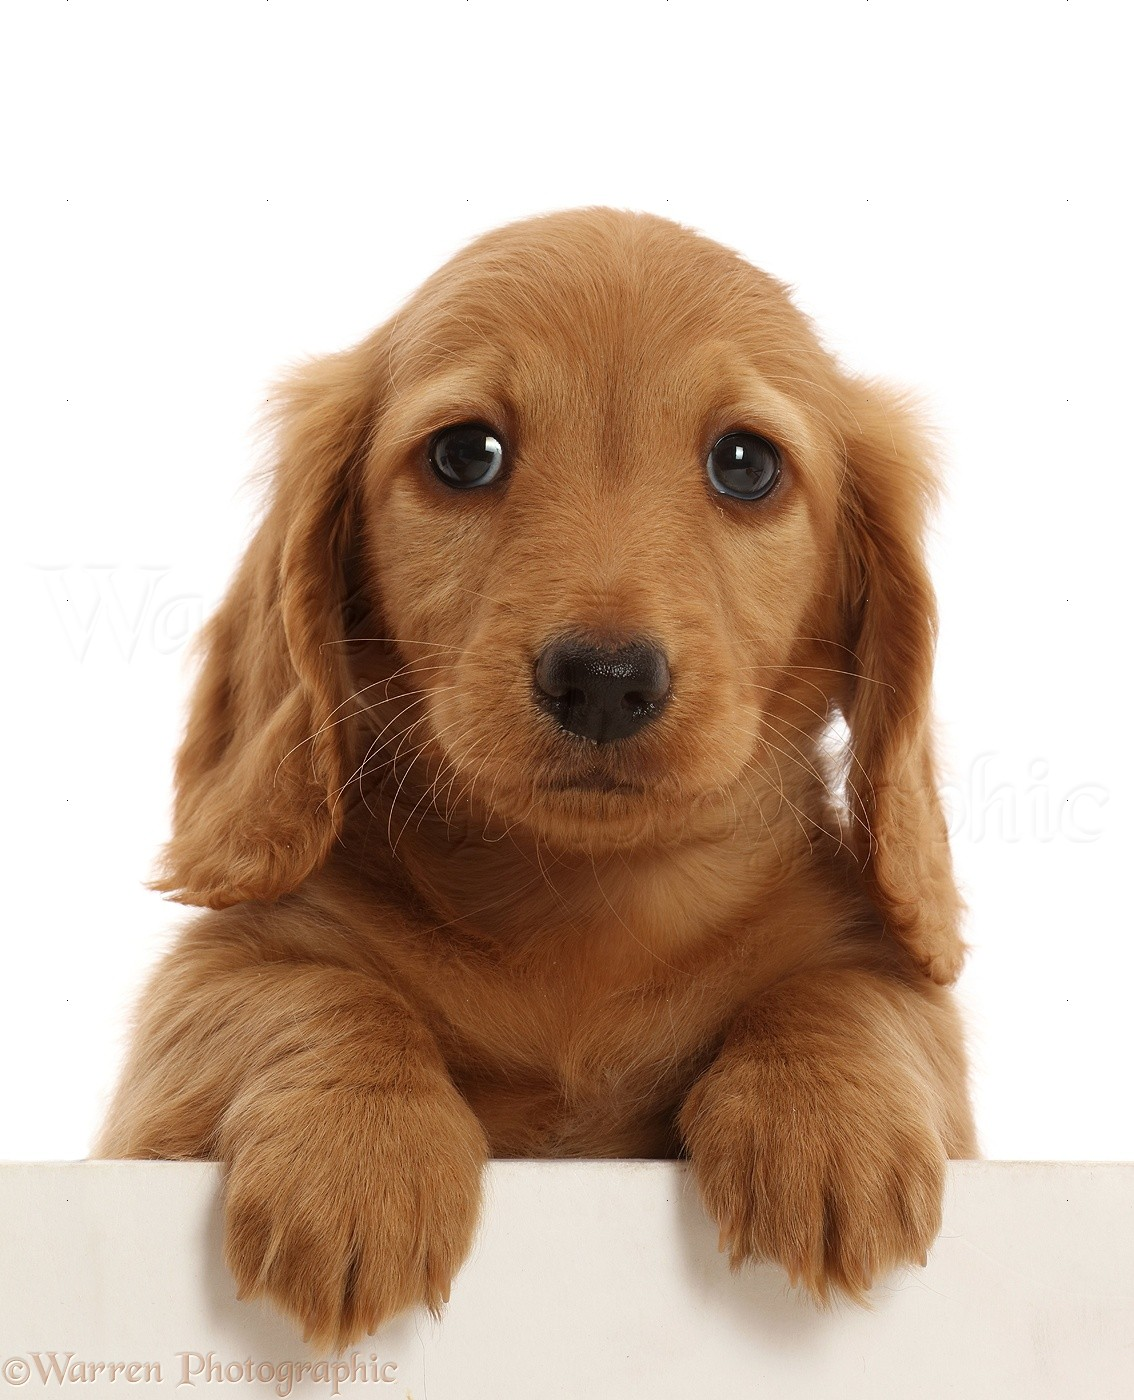 Dog Cream Dachshund Puppy 7 Weeks Old Paws Over Photo Wp48006